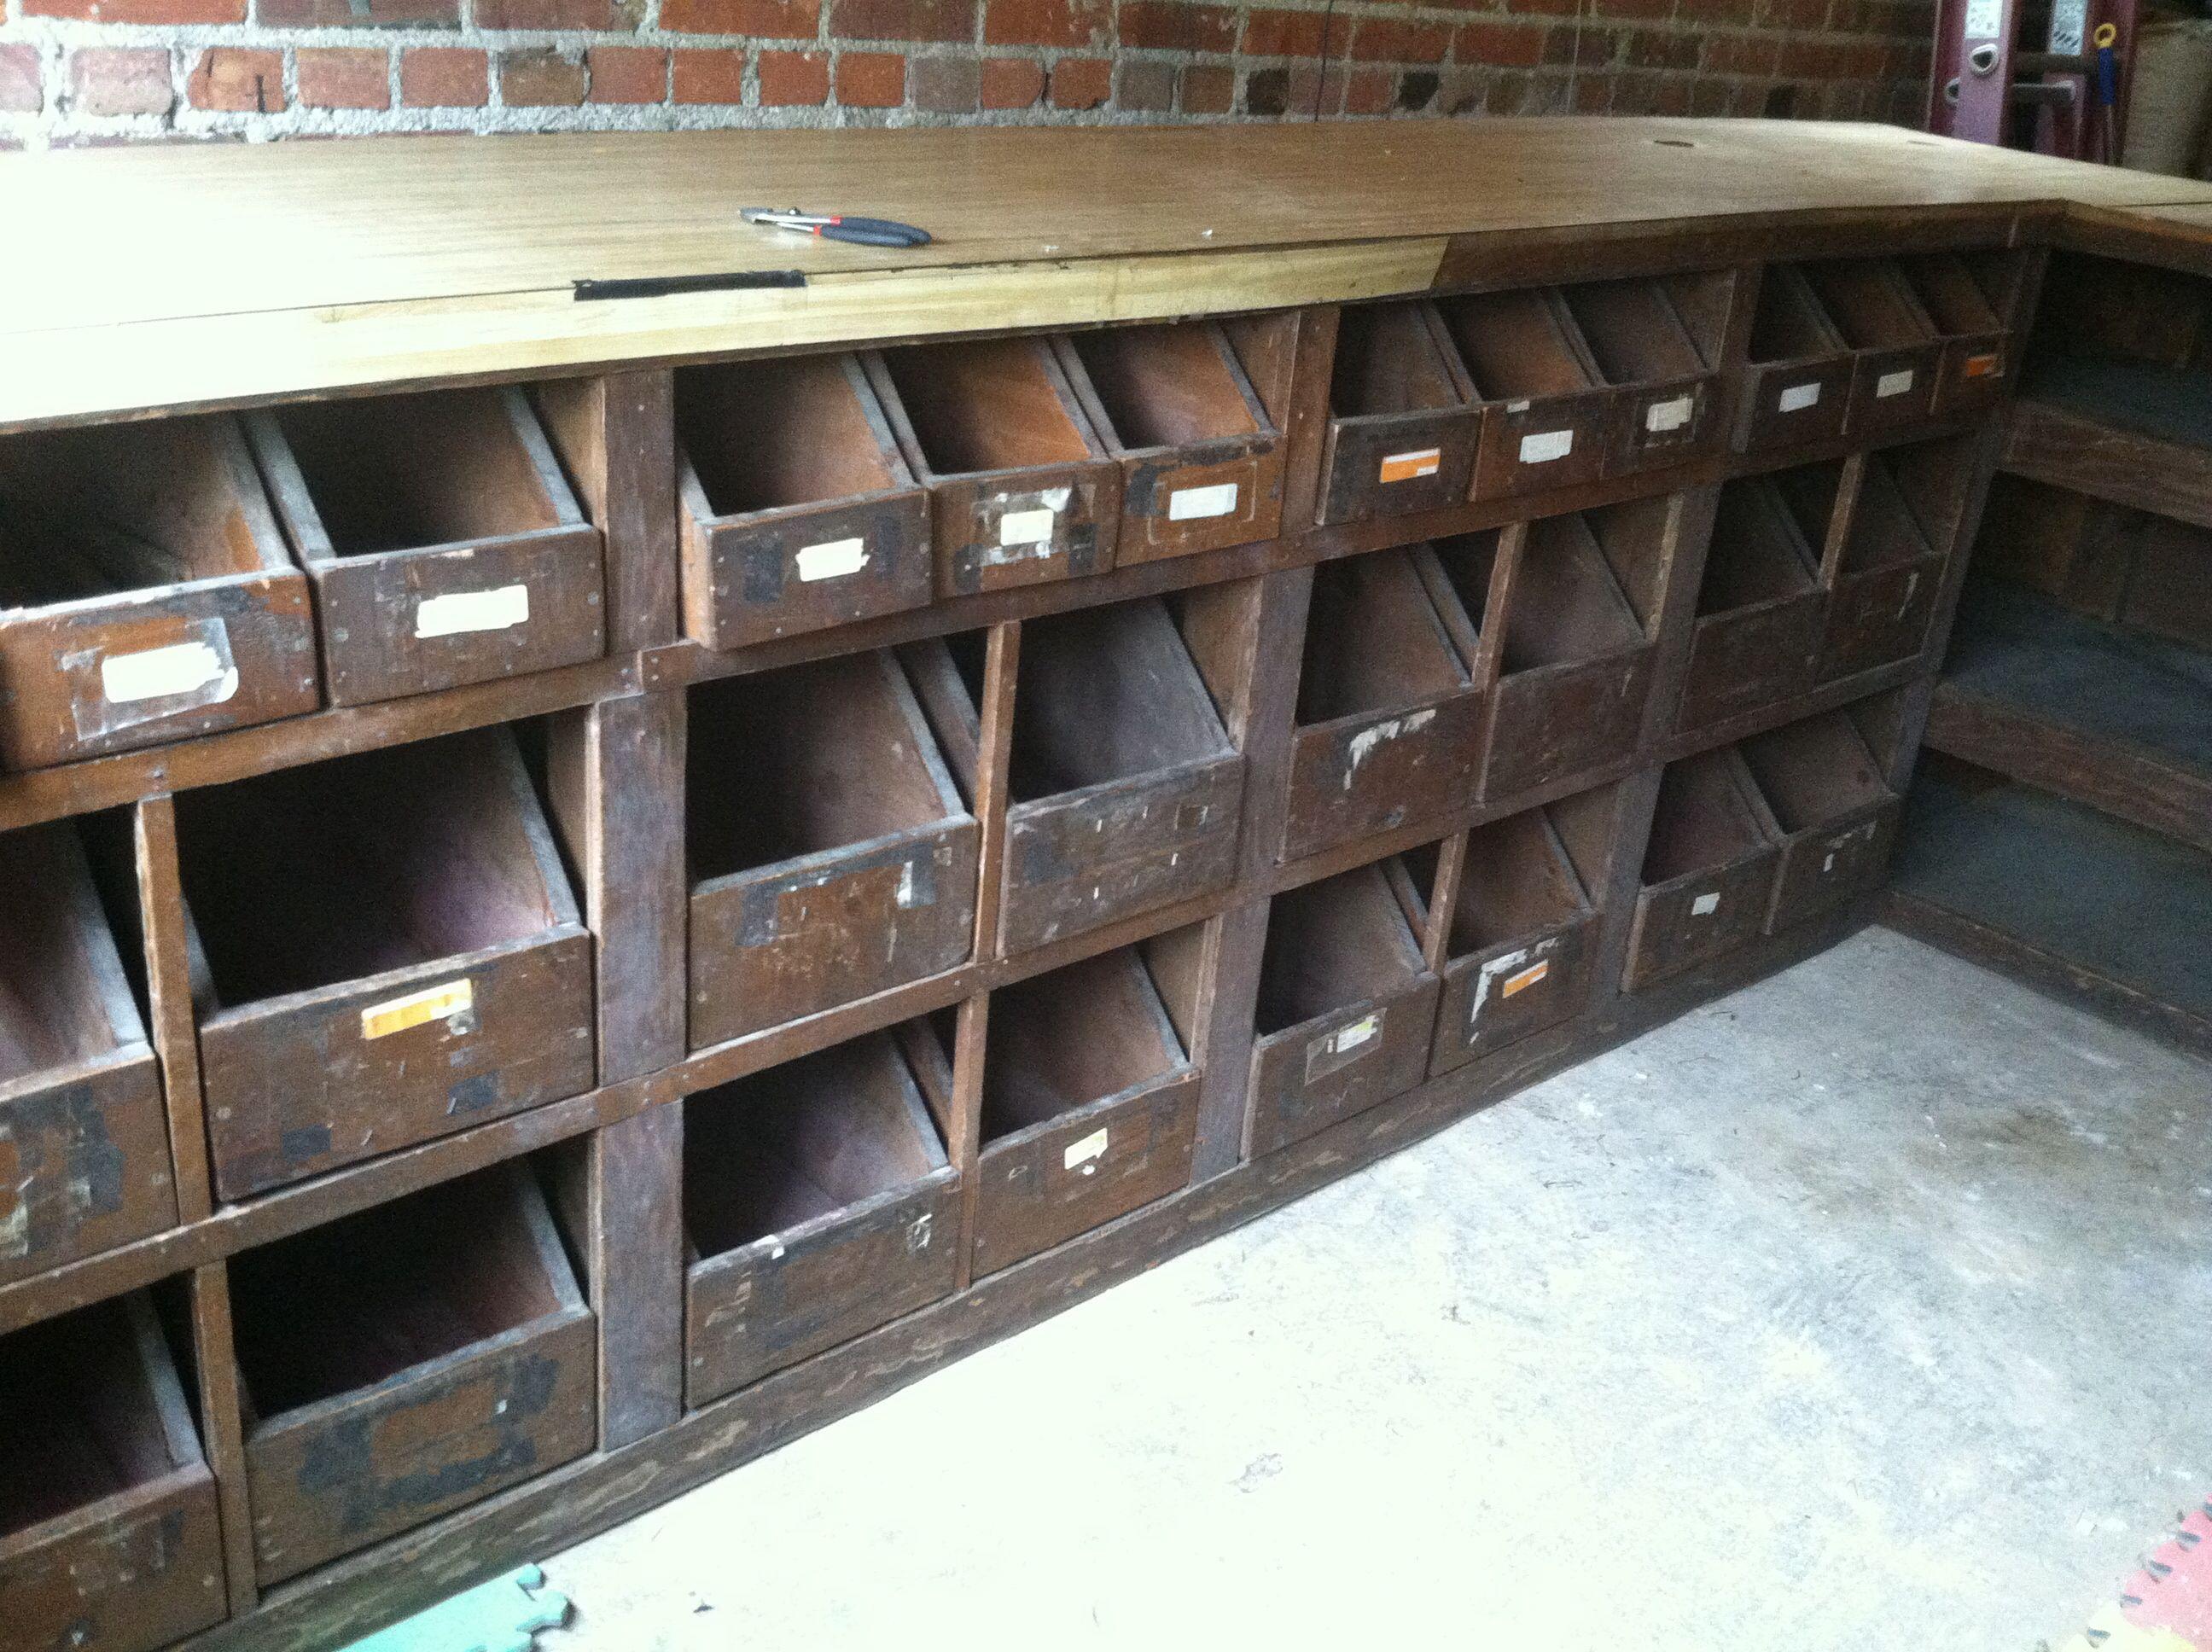 Old Hardware Store Seed Bins That Are Now In My Garage Wine Store Design Vintage Lockers Vintage Storage